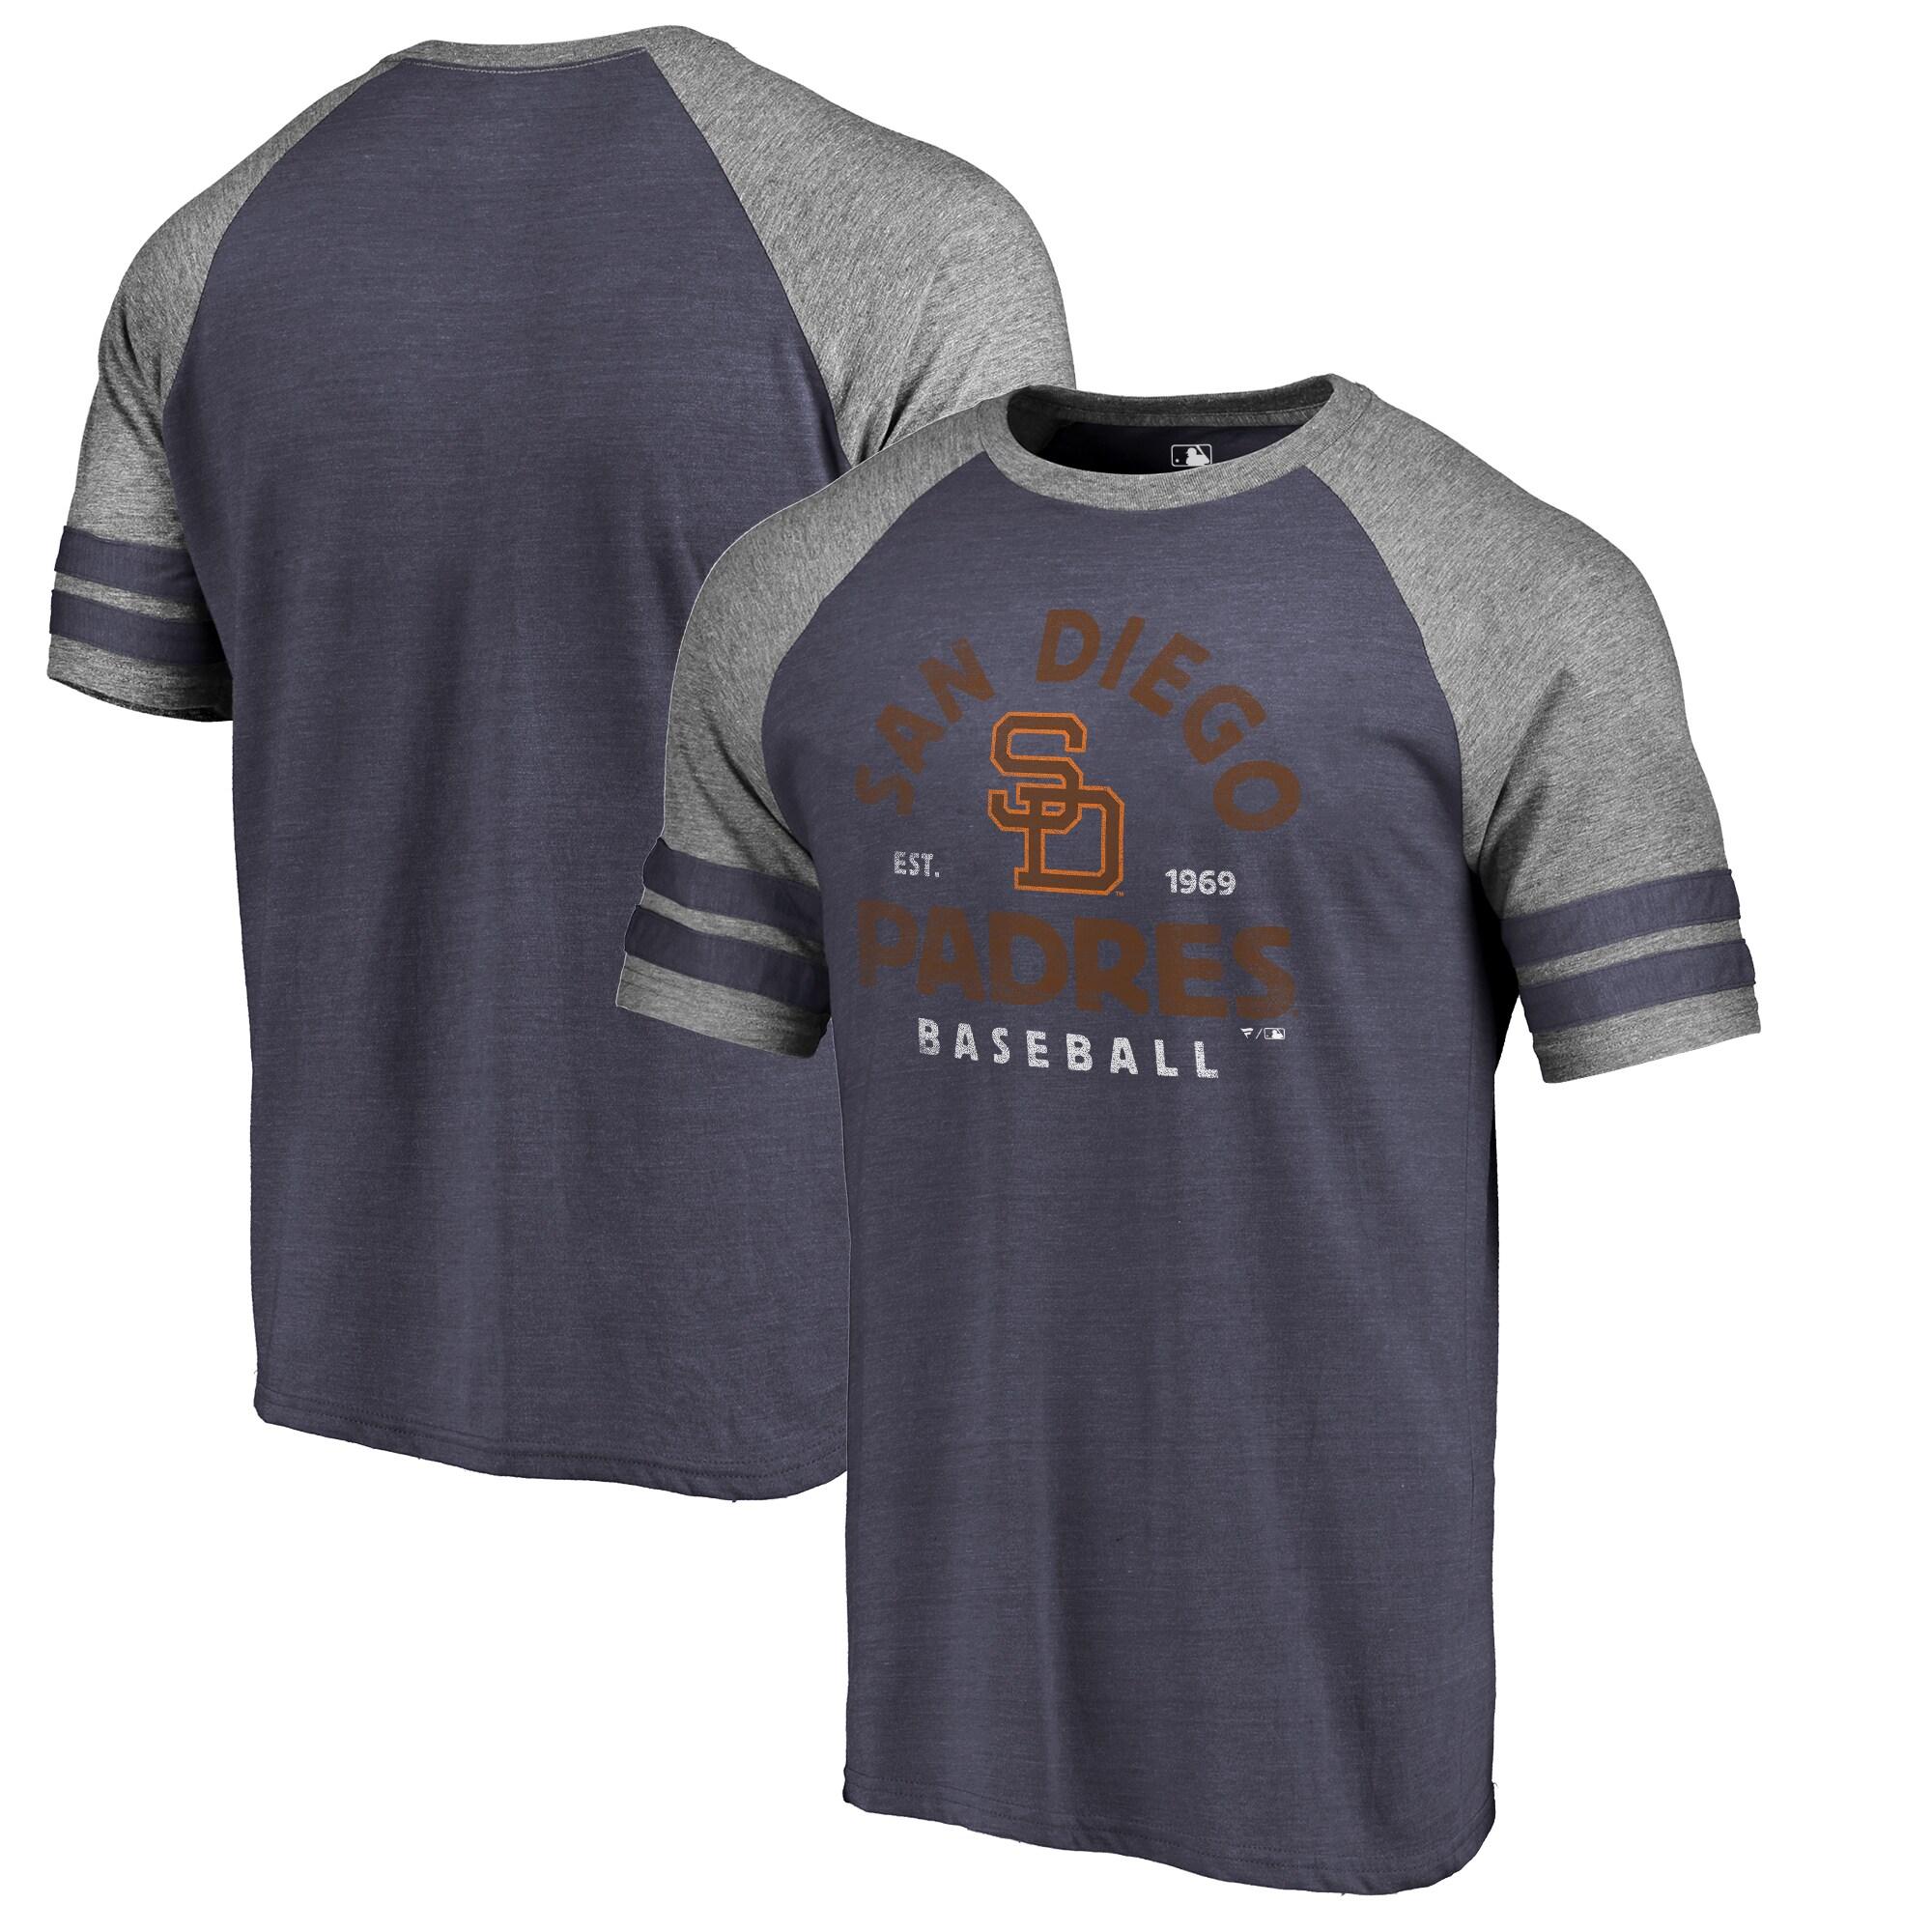 San Diego Padres Fanatics Branded Cooperstown Collection Vintage Arch Tri-Blend Raglan T-Shirt - Navy